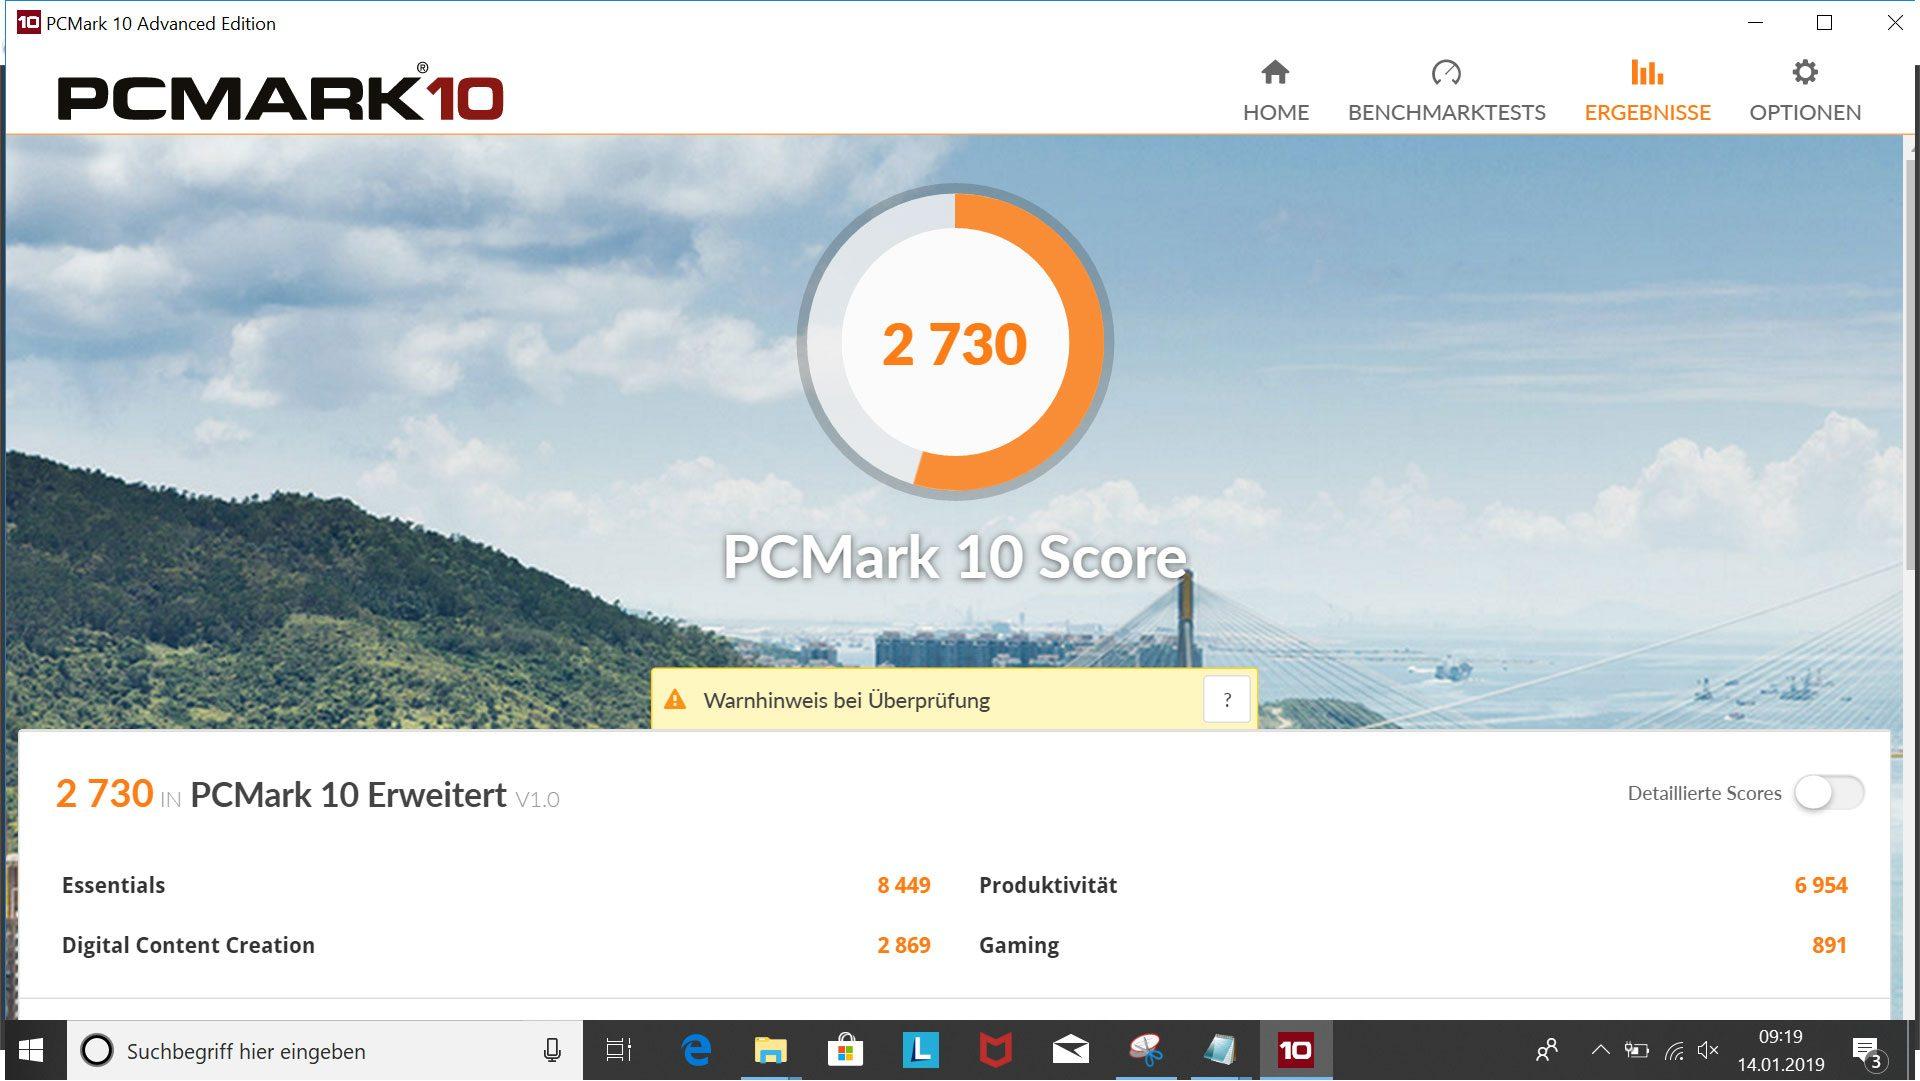 Lenovo YOGA S730-13IWL Benchmark_3